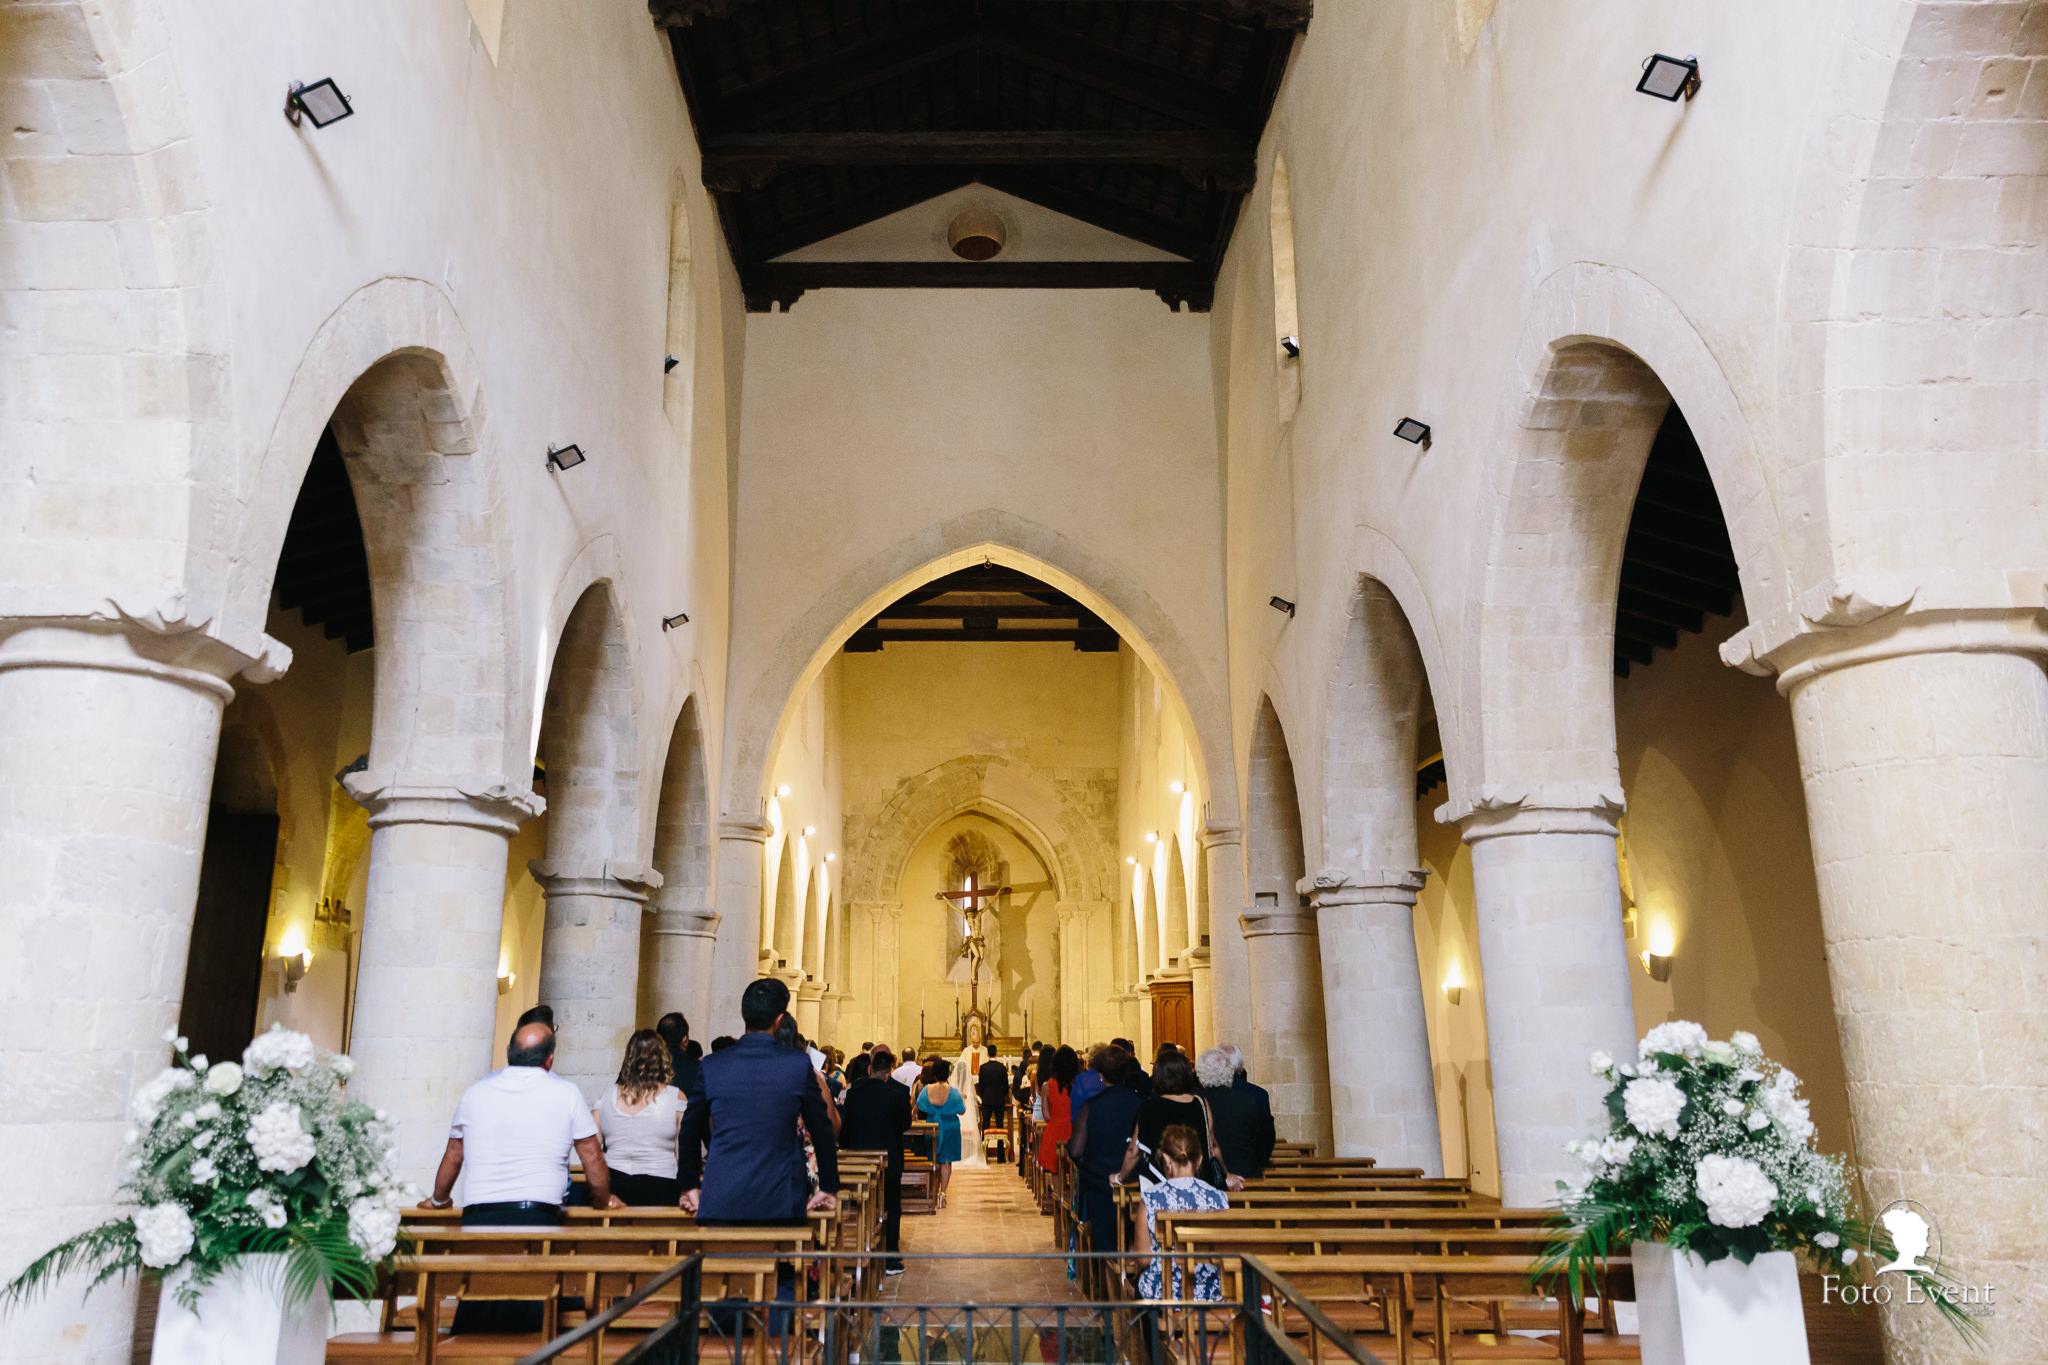 023-2019-08-23-Matrimonio-Lucia-e-Rosario-Scopelliti-5DE-1308